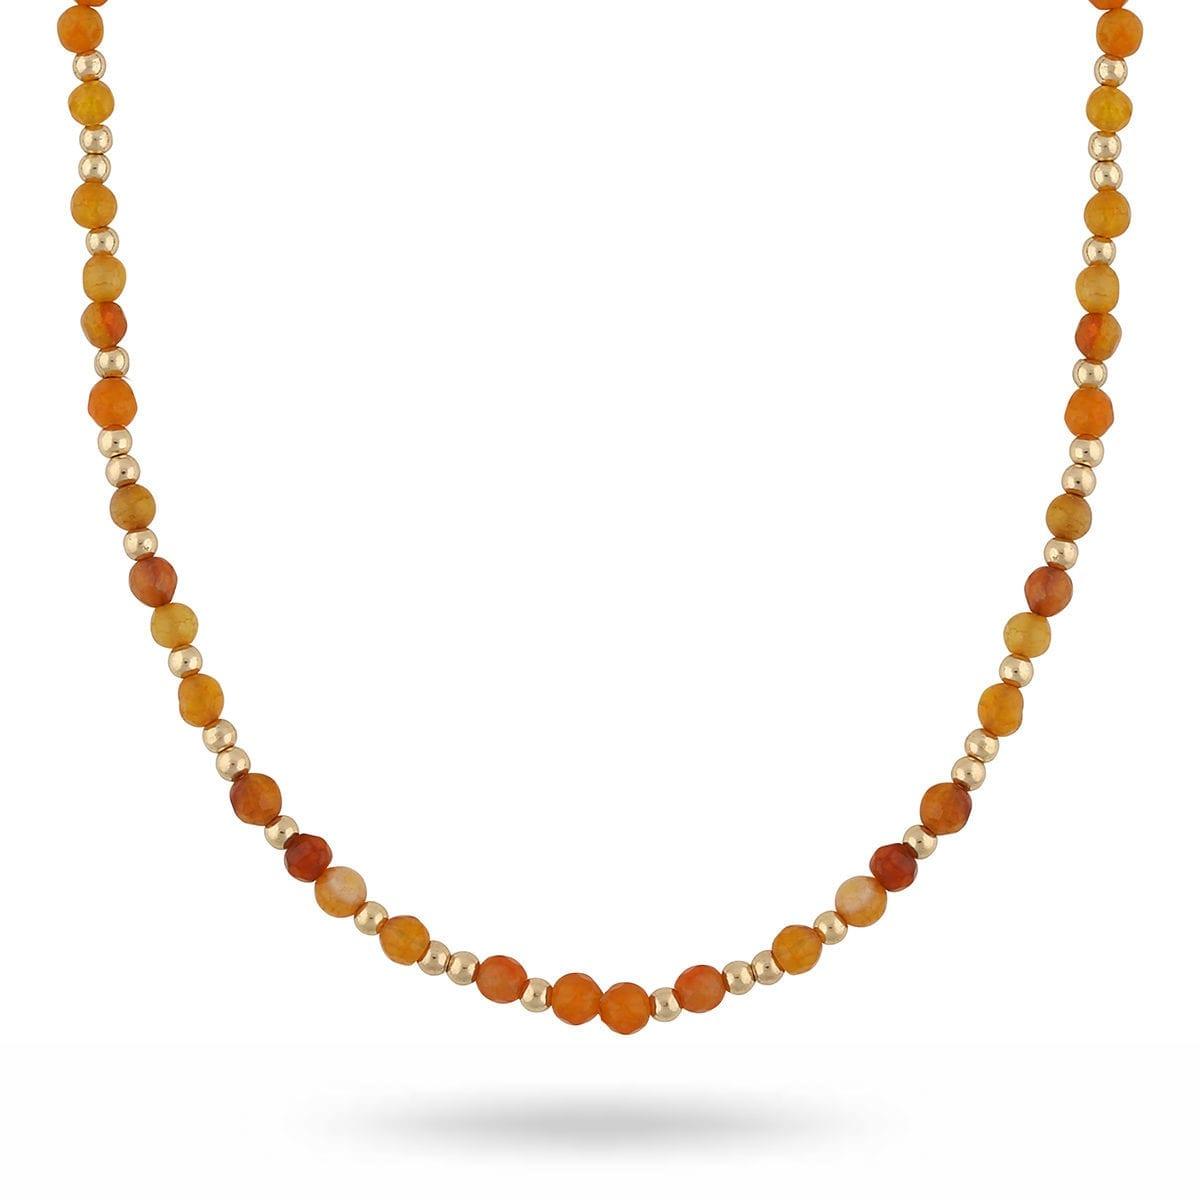 1004-0101224-Roc-neck-42-g-amber-1